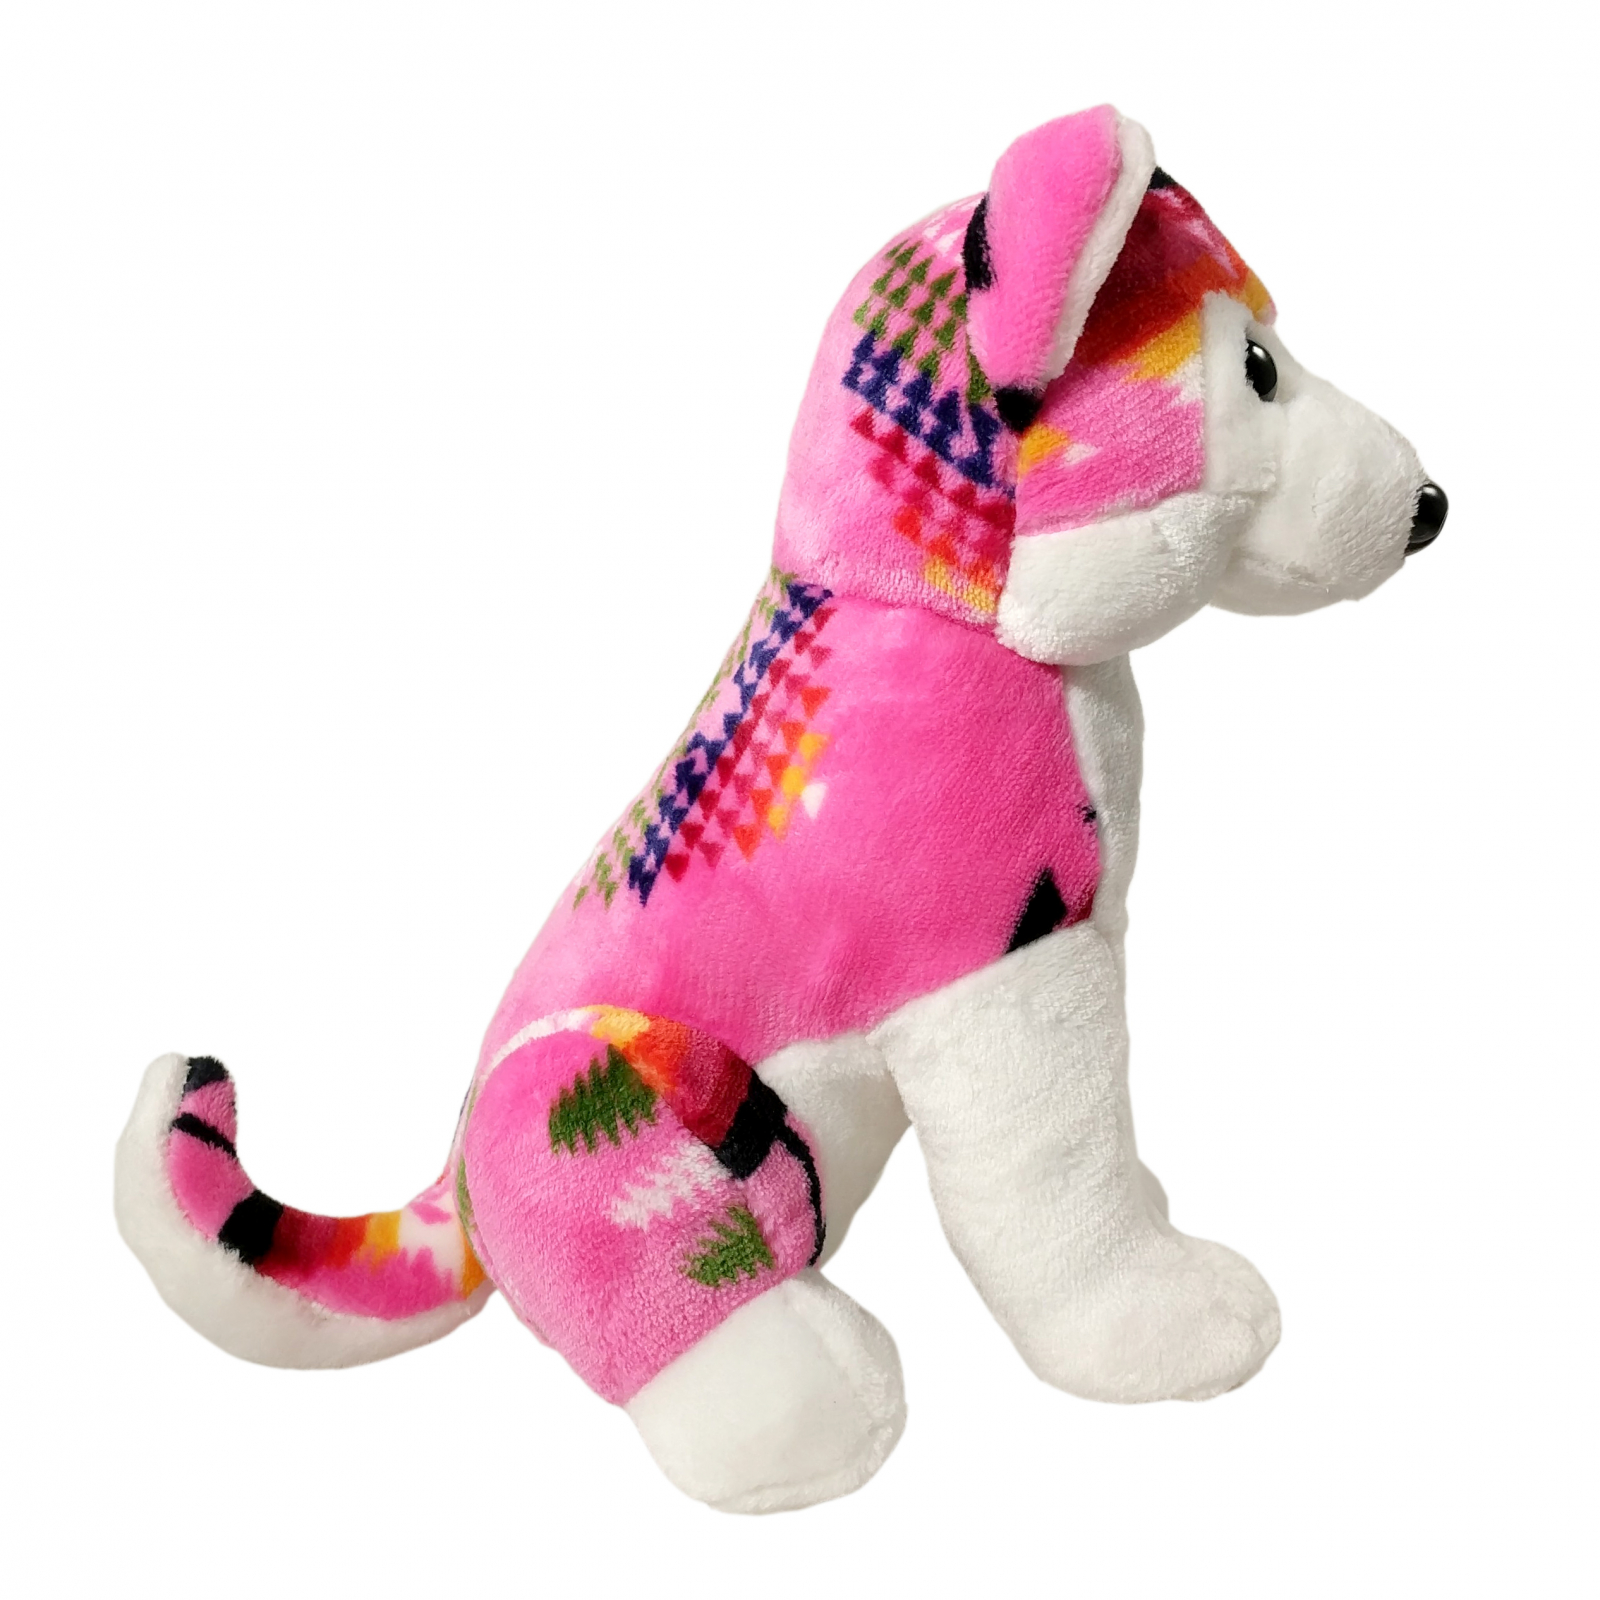 TychoTyke Stuffed Animal Husky Plush Toy Southwest Pink